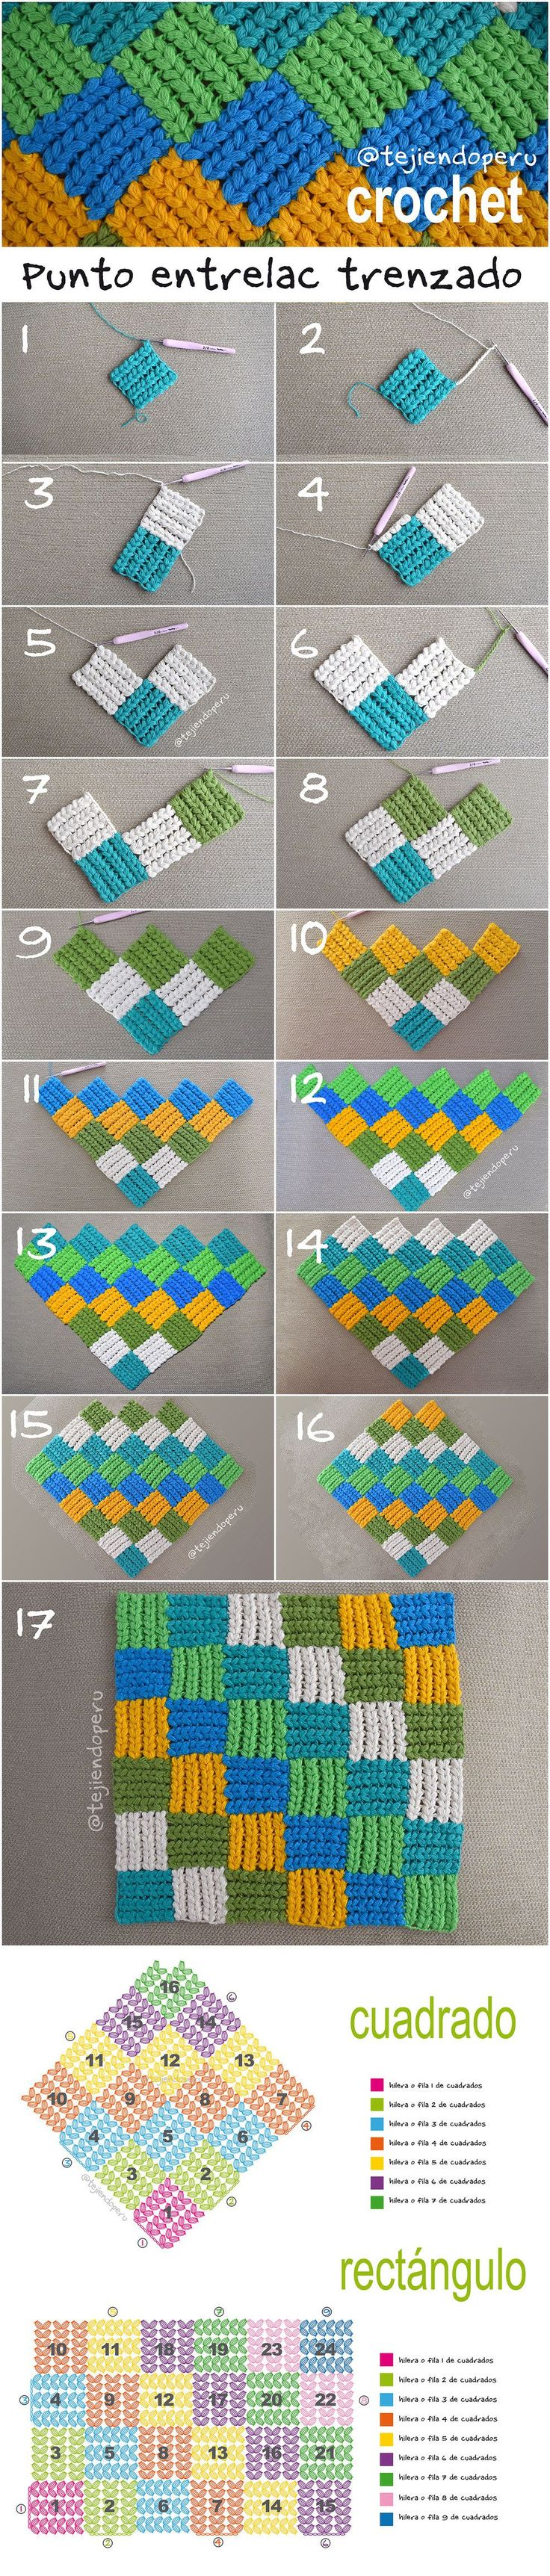 11 Best Cubrecamas Images On Pinterest Crochet Blankets By Tashiab Basic Granny Square Stitch Diagram Punto Entrelac Trenzado A